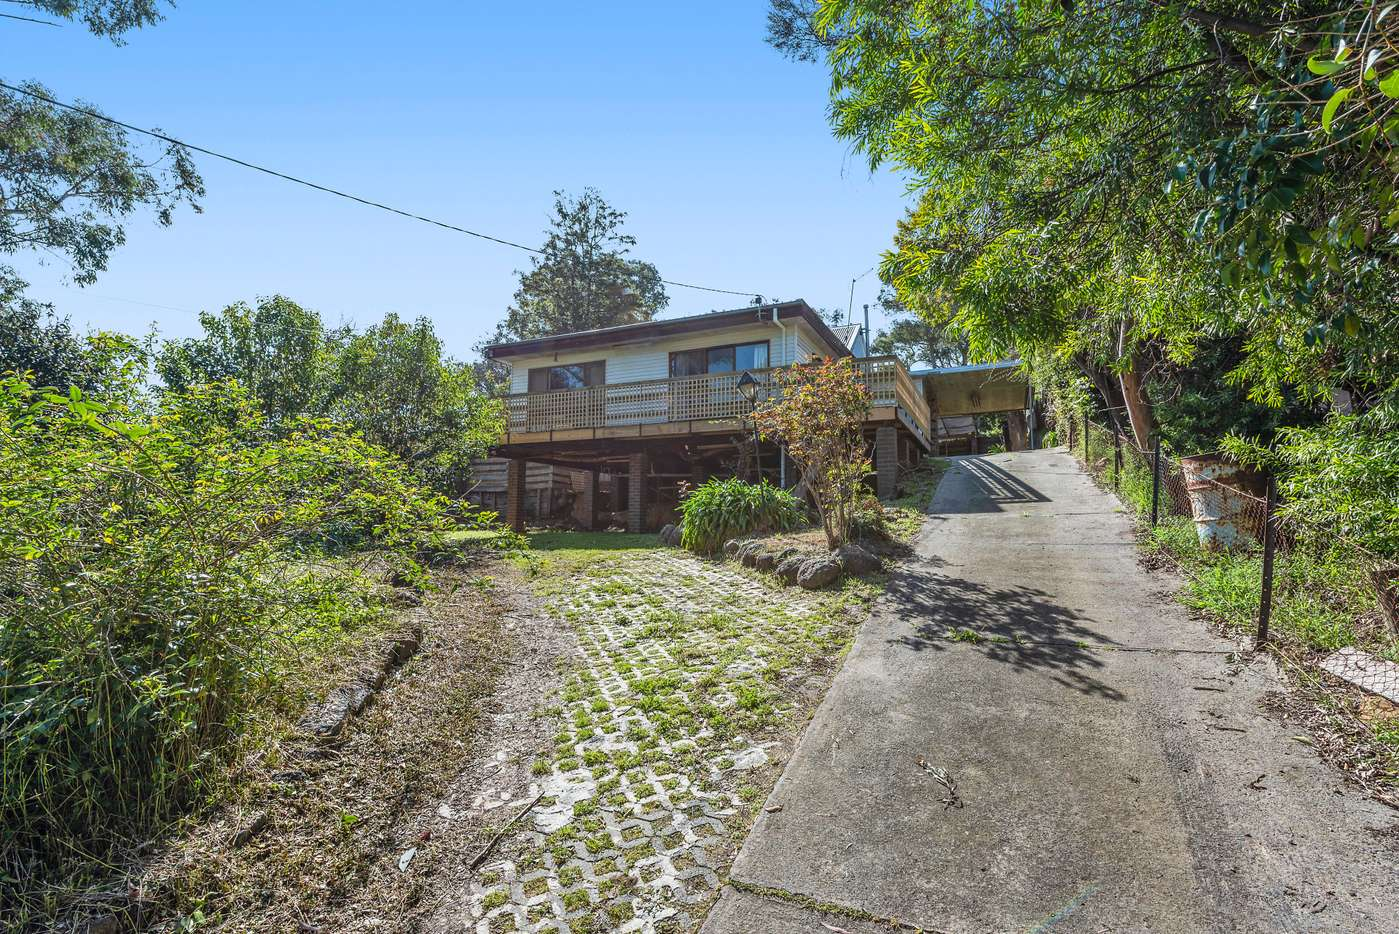 Main view of Homely house listing, 9 Rose Avenue, Hurstbridge, VIC 3099